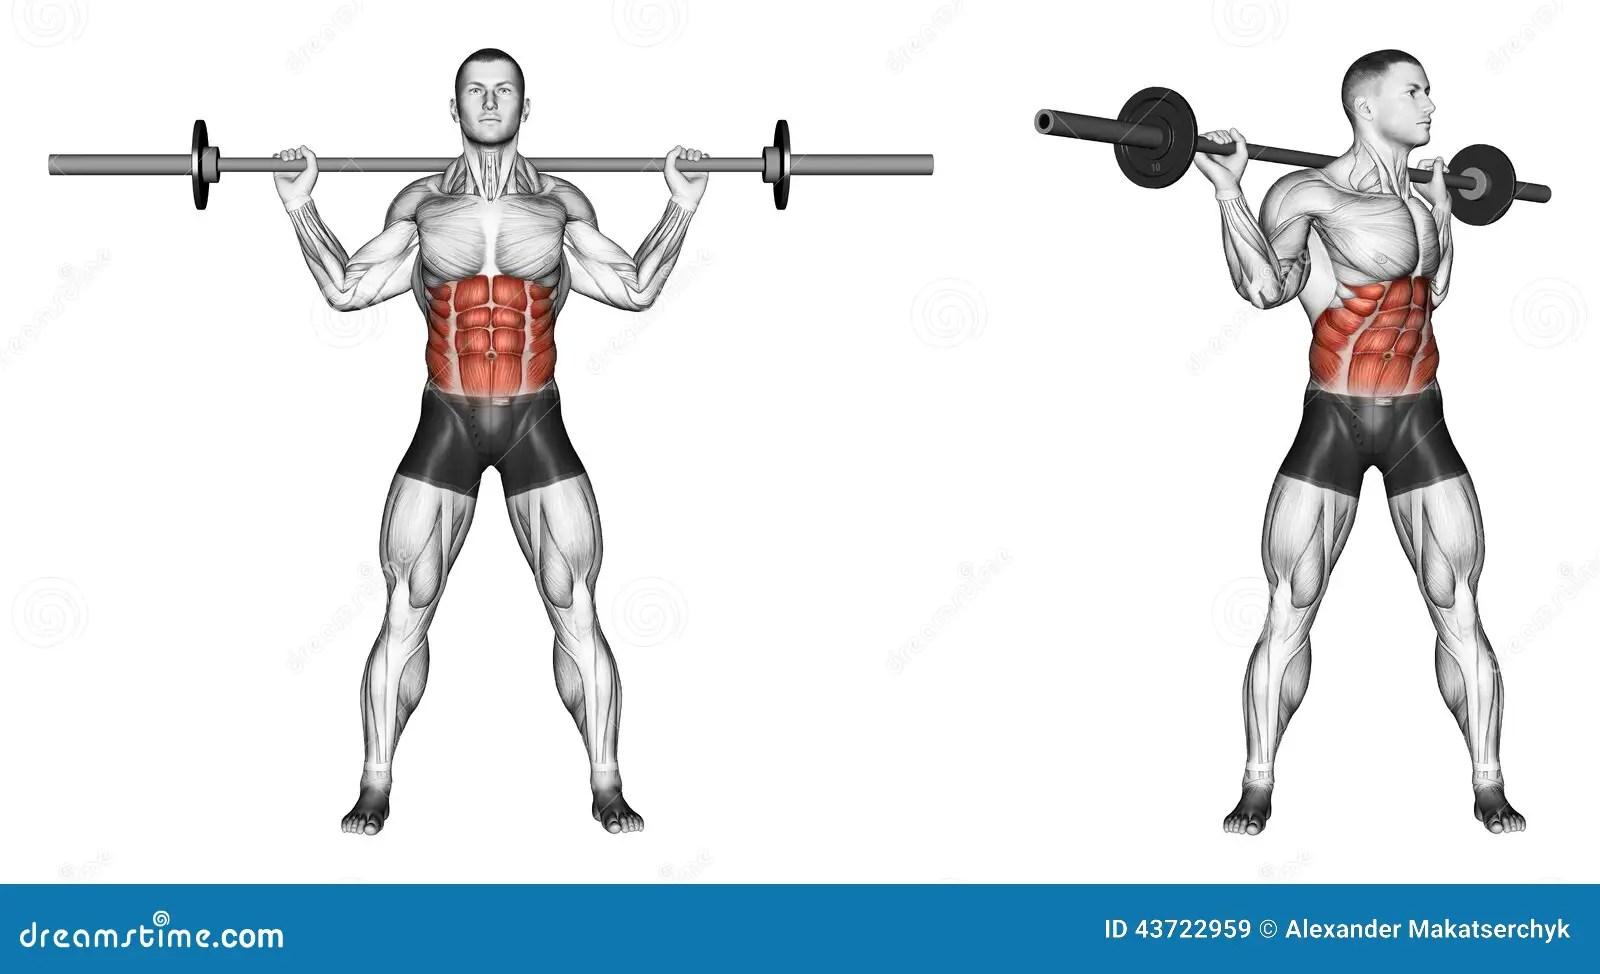 S Exercer Tourne Le Torse Avec Le Barbell Illustration